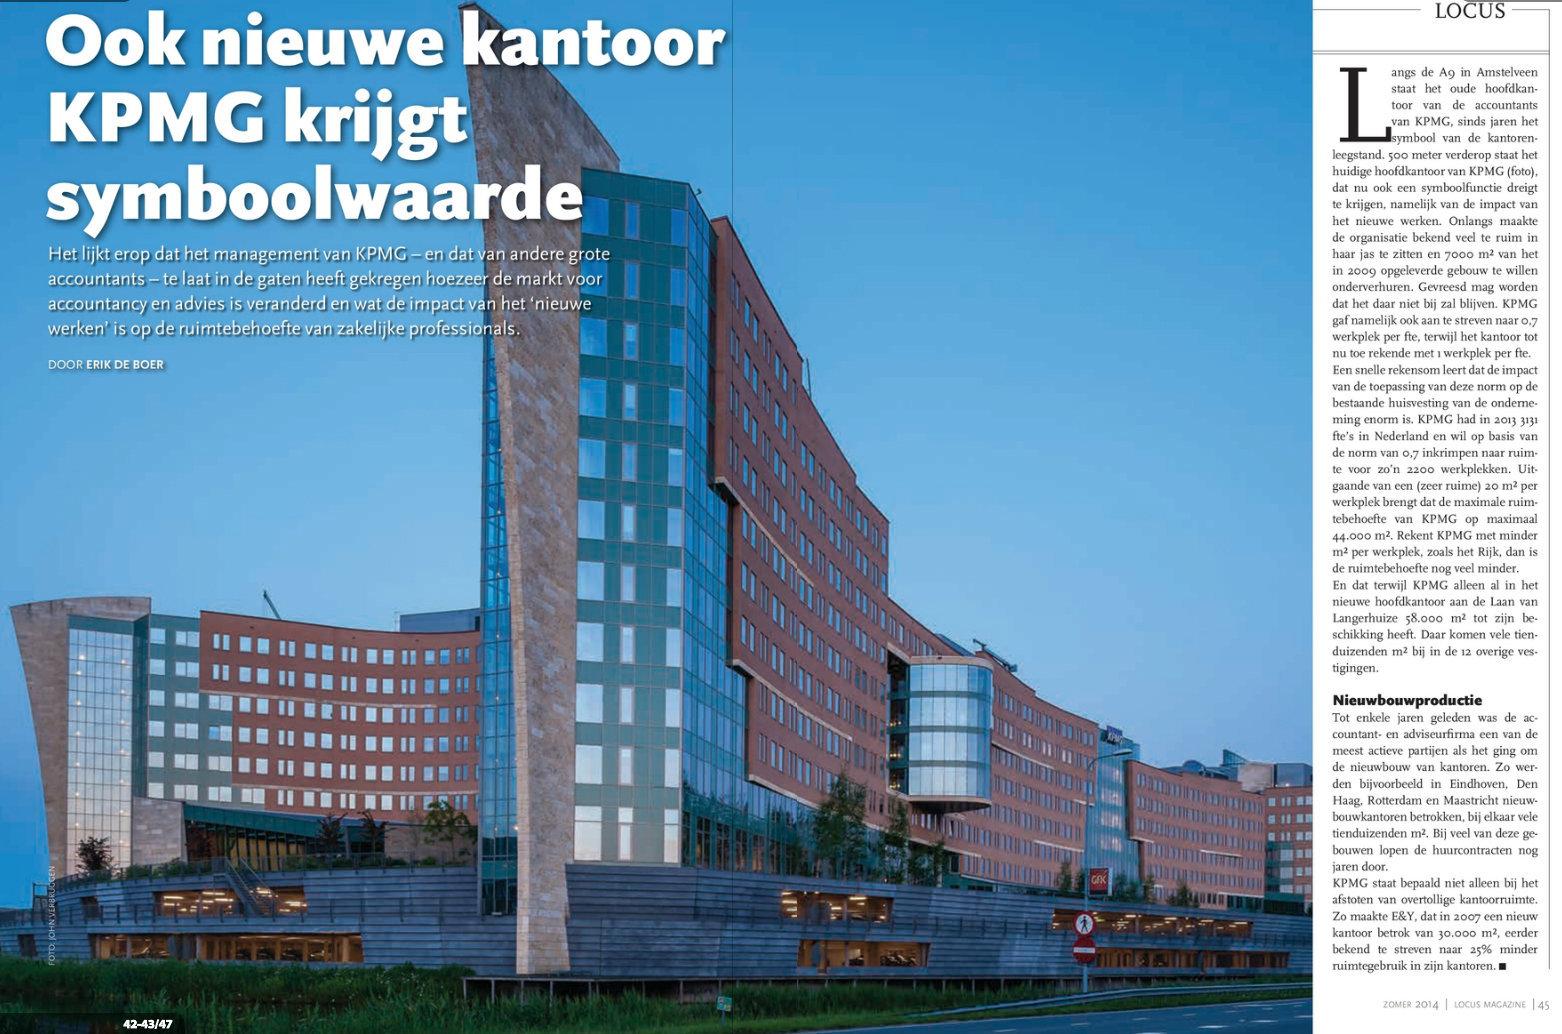 Locus (Bijlage FD) zomer 2014 i.o.v. PropertyNL